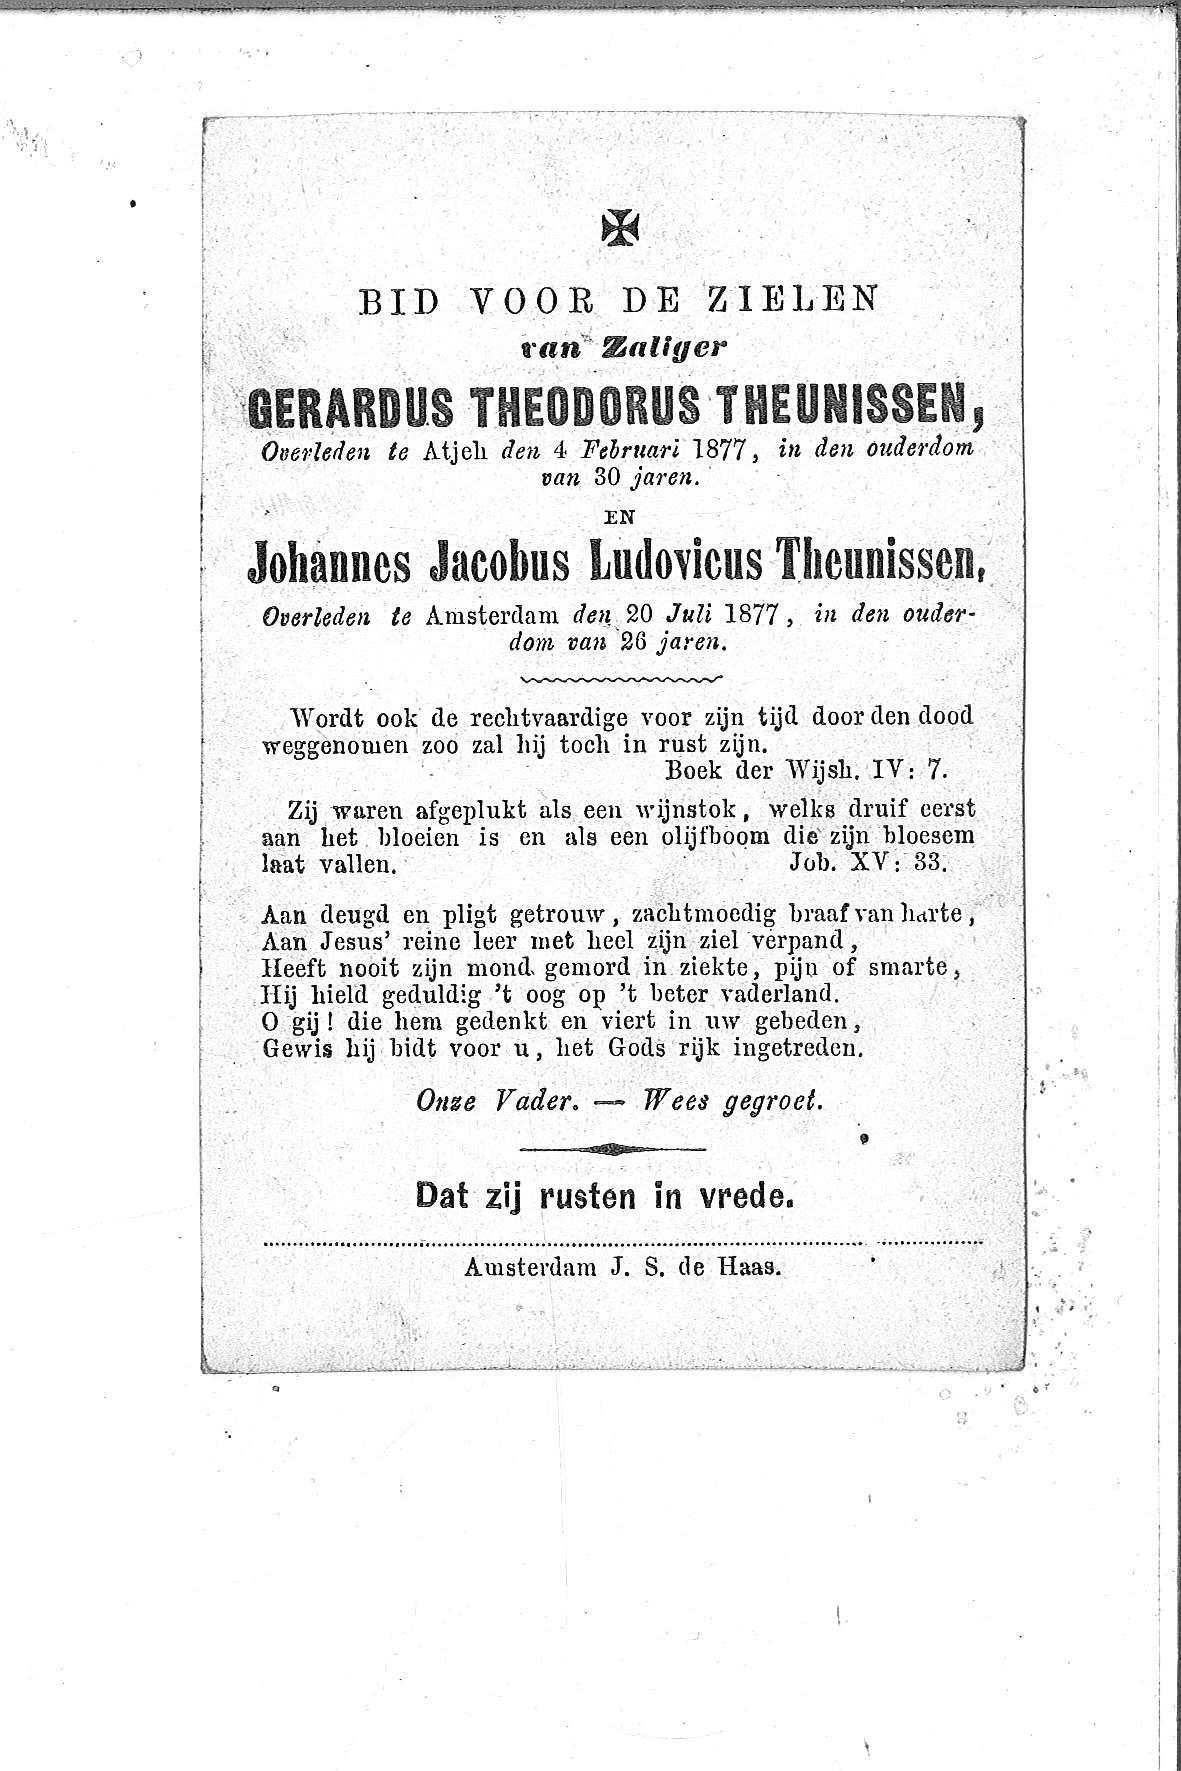 Gerardus-Theodorus(1877)20140813084409_00015.jpg